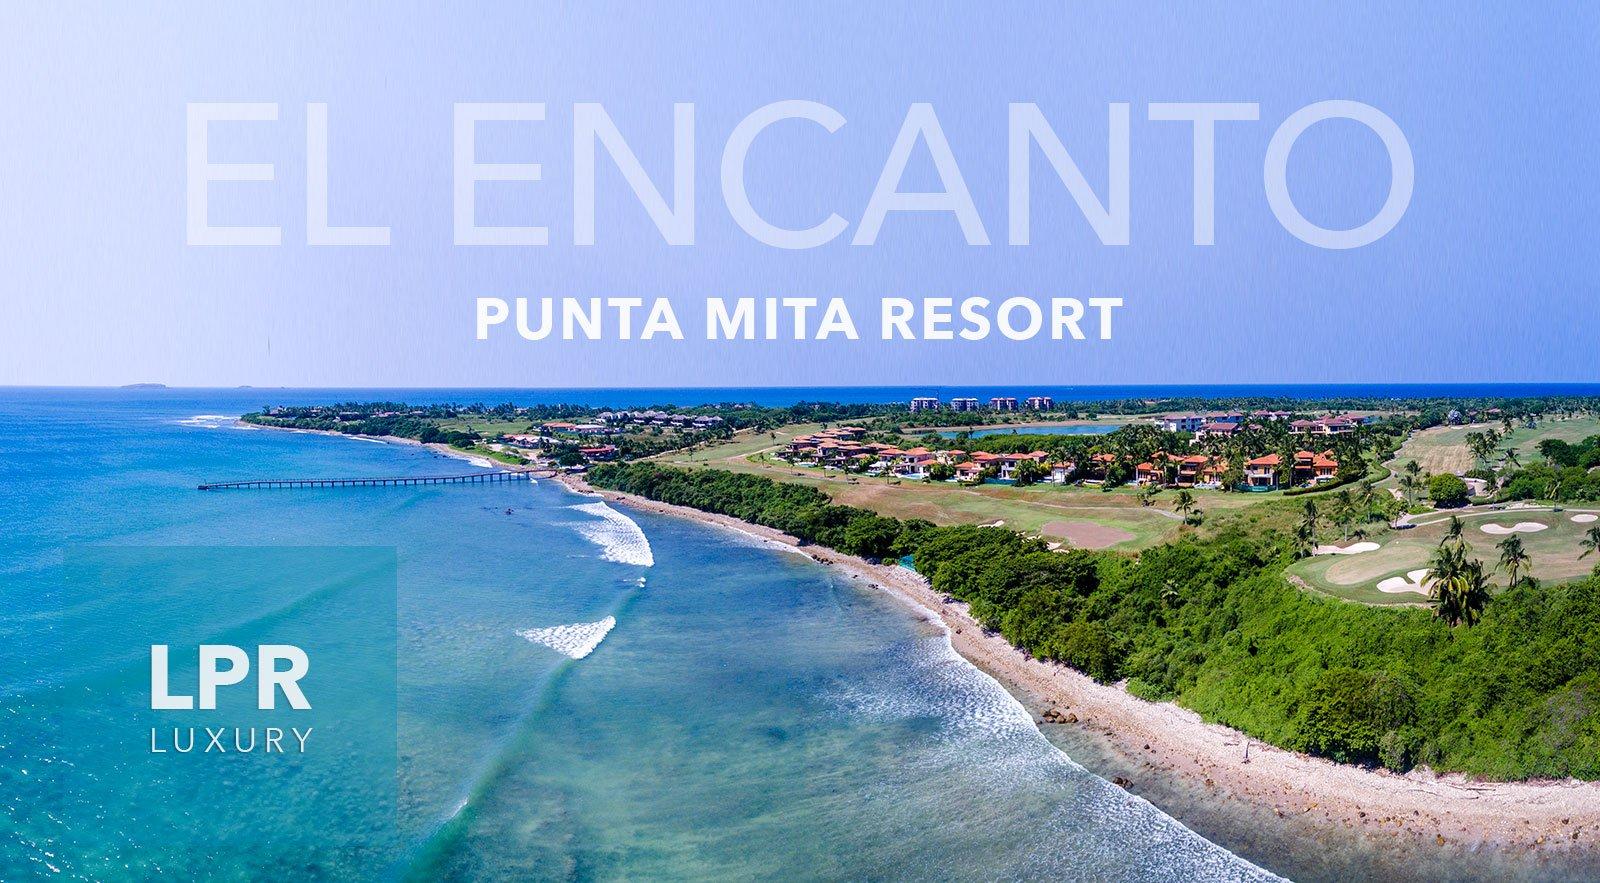 El Encanto - Luxury real estate and vacation rentals at the Punta Mita Resort, Riviera Nayarit, Mexico